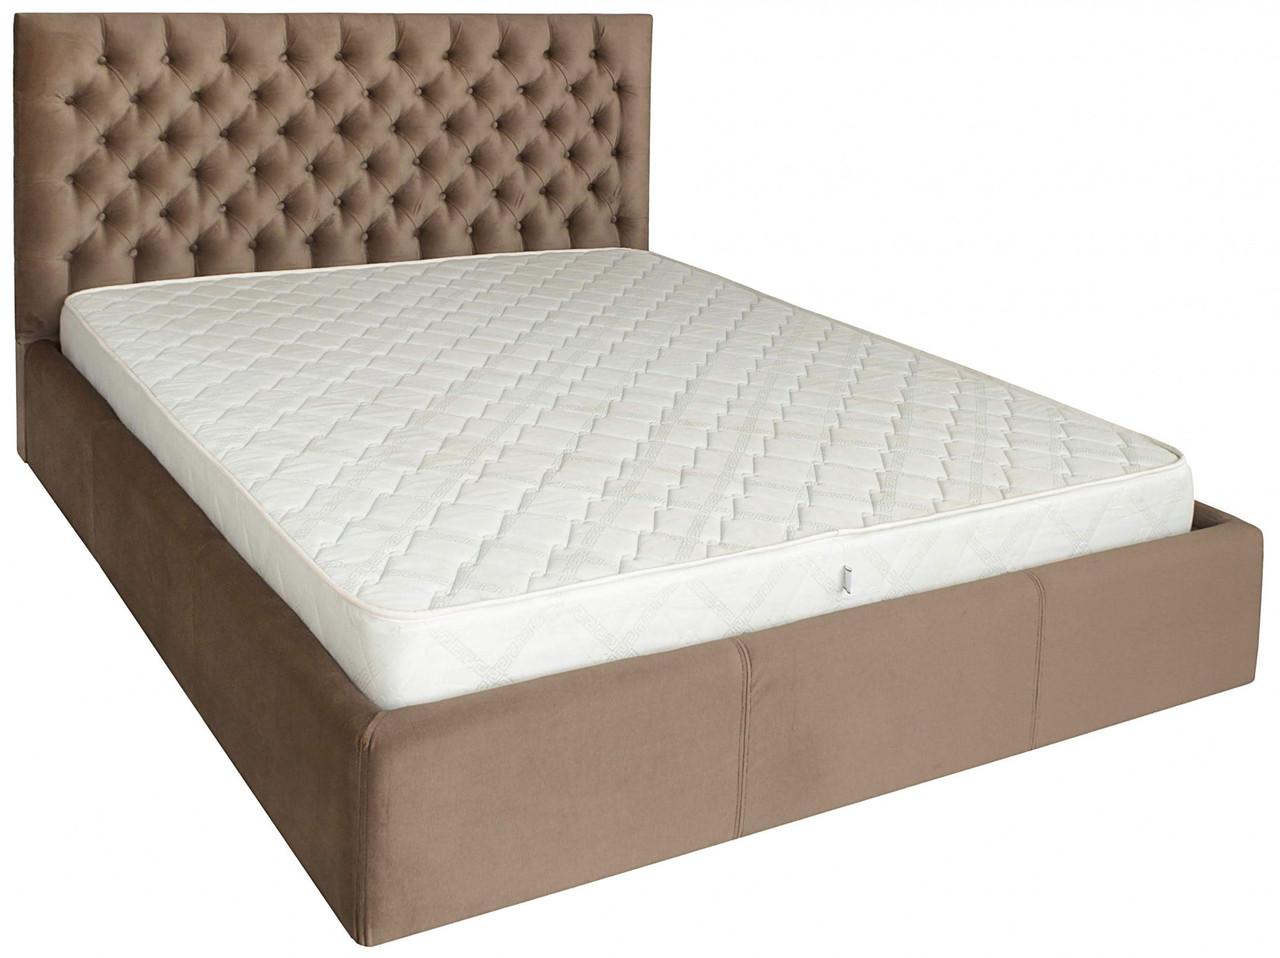 Кровать Cambridge Standard 120 х 190 см Missoni 04 Светло-коричневая